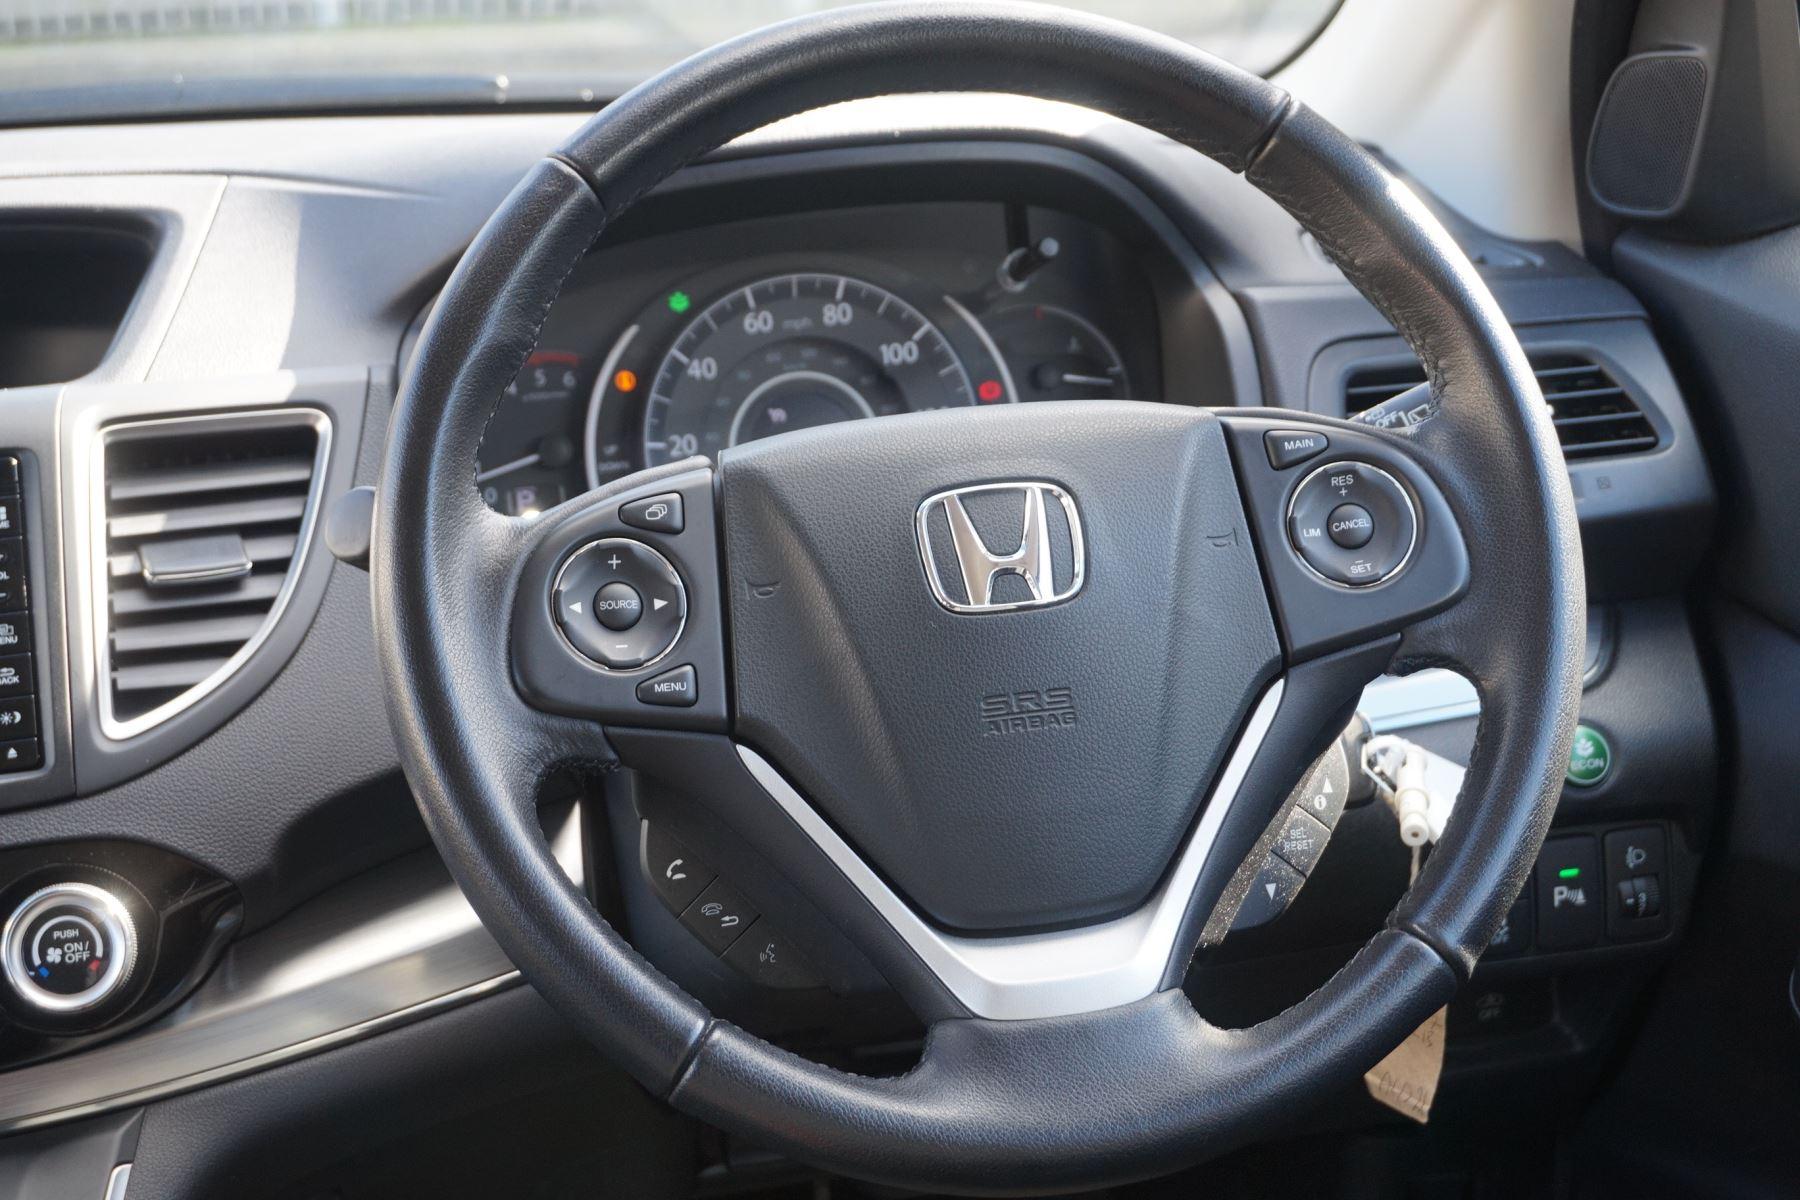 Honda CR-V 1.6 i-DTEC 160 SE Plus 5dr [Nav] 4WD image 16